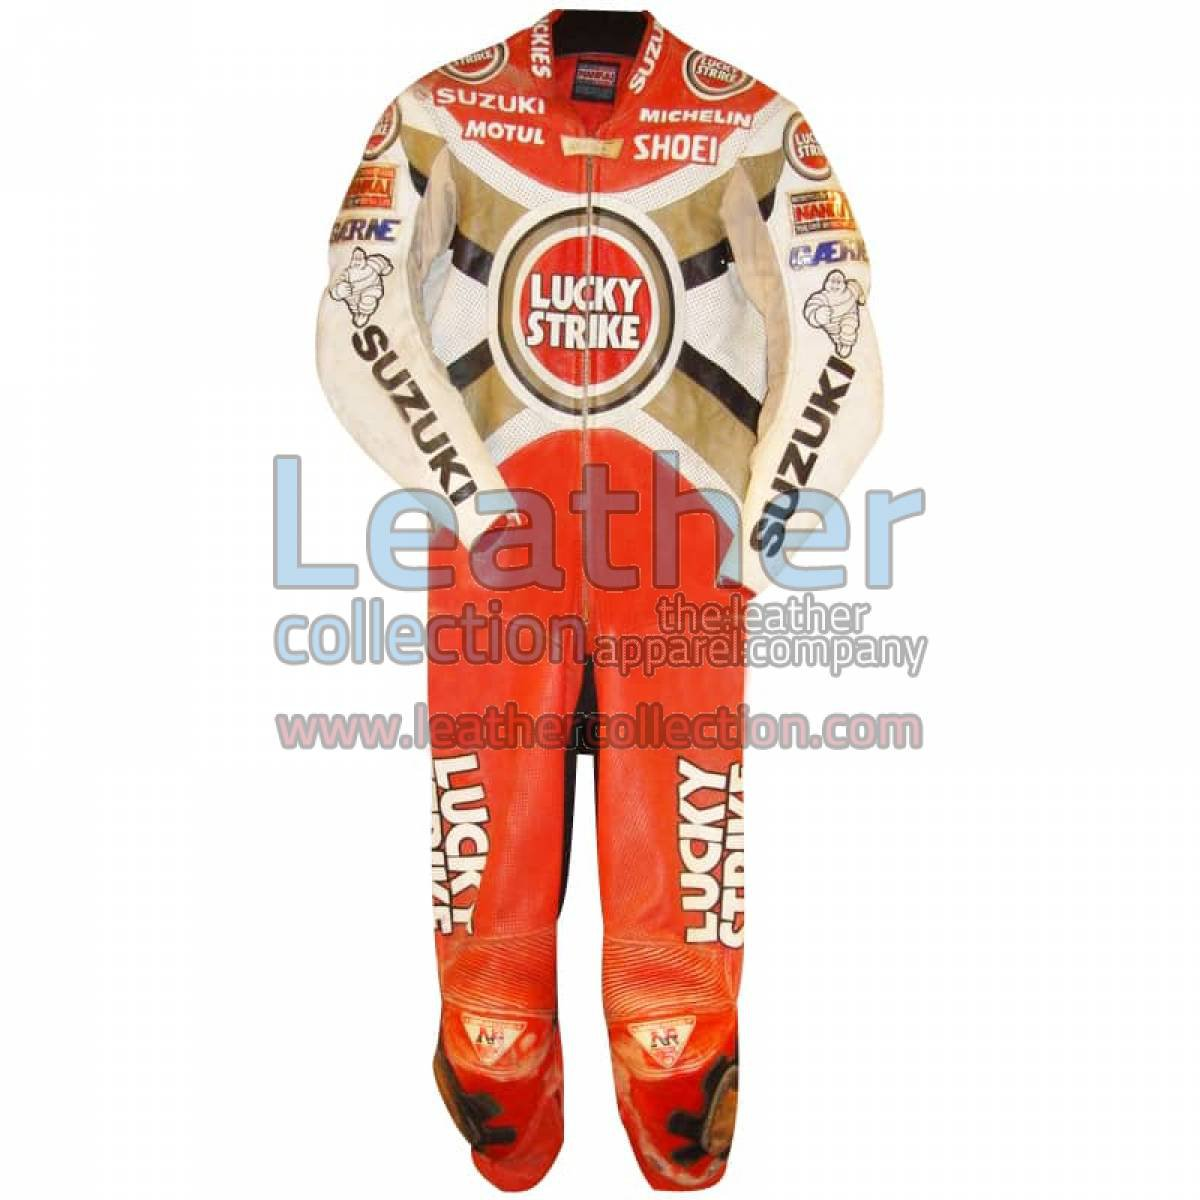 Alex Barros Suzuki Lucky Strike 1994 MotoGP Leathers